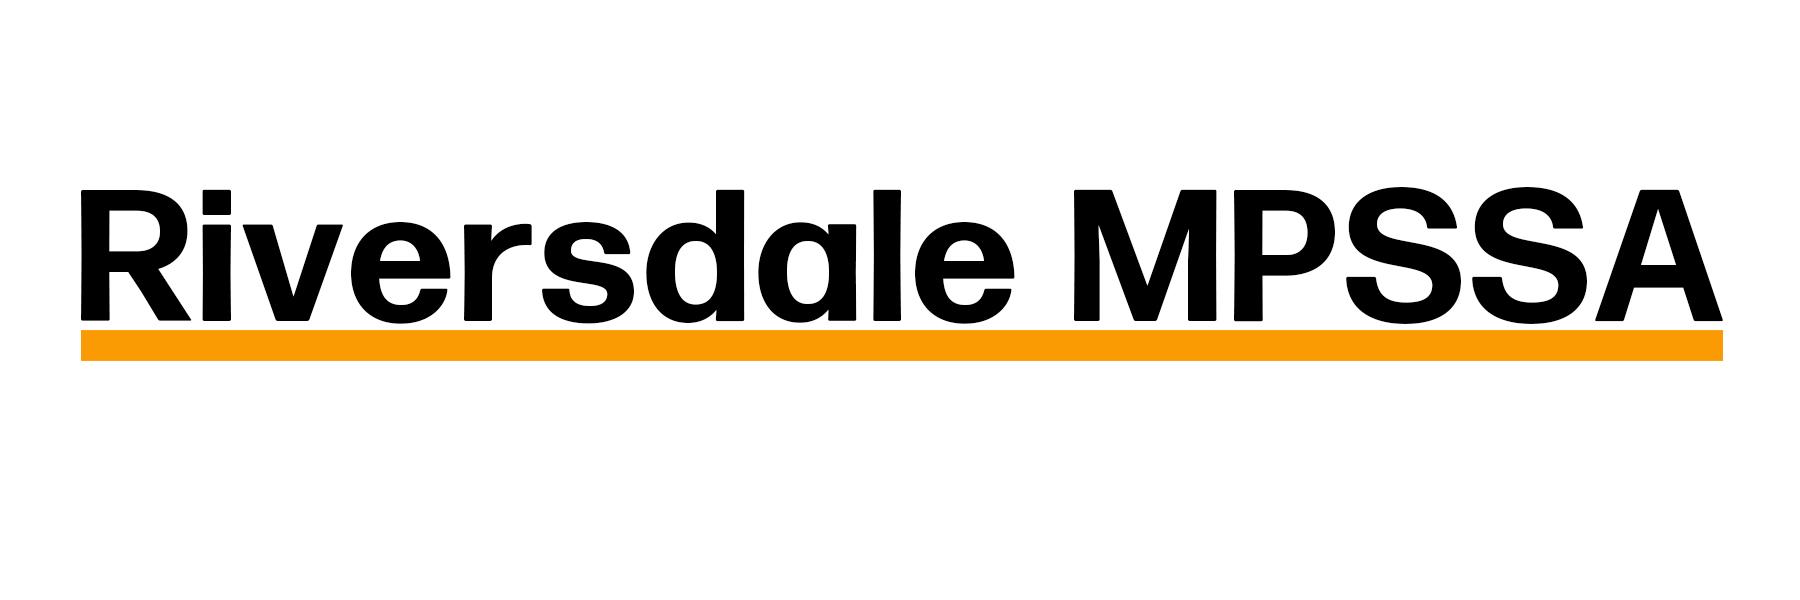 Riversdale MPSSA